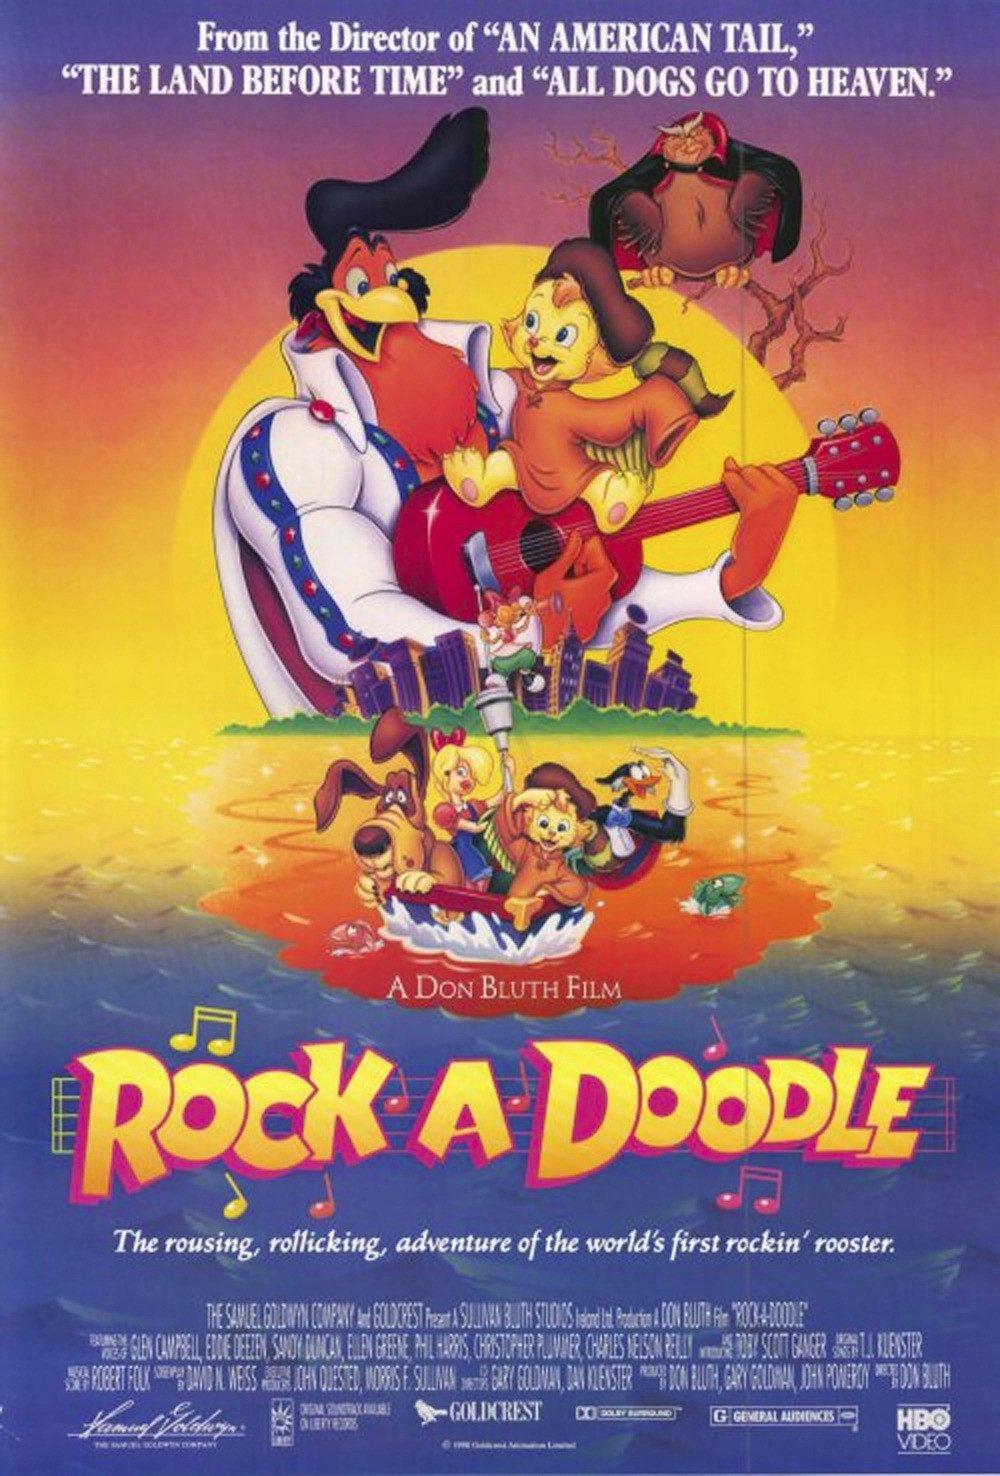 Rock-a-Doodle poster